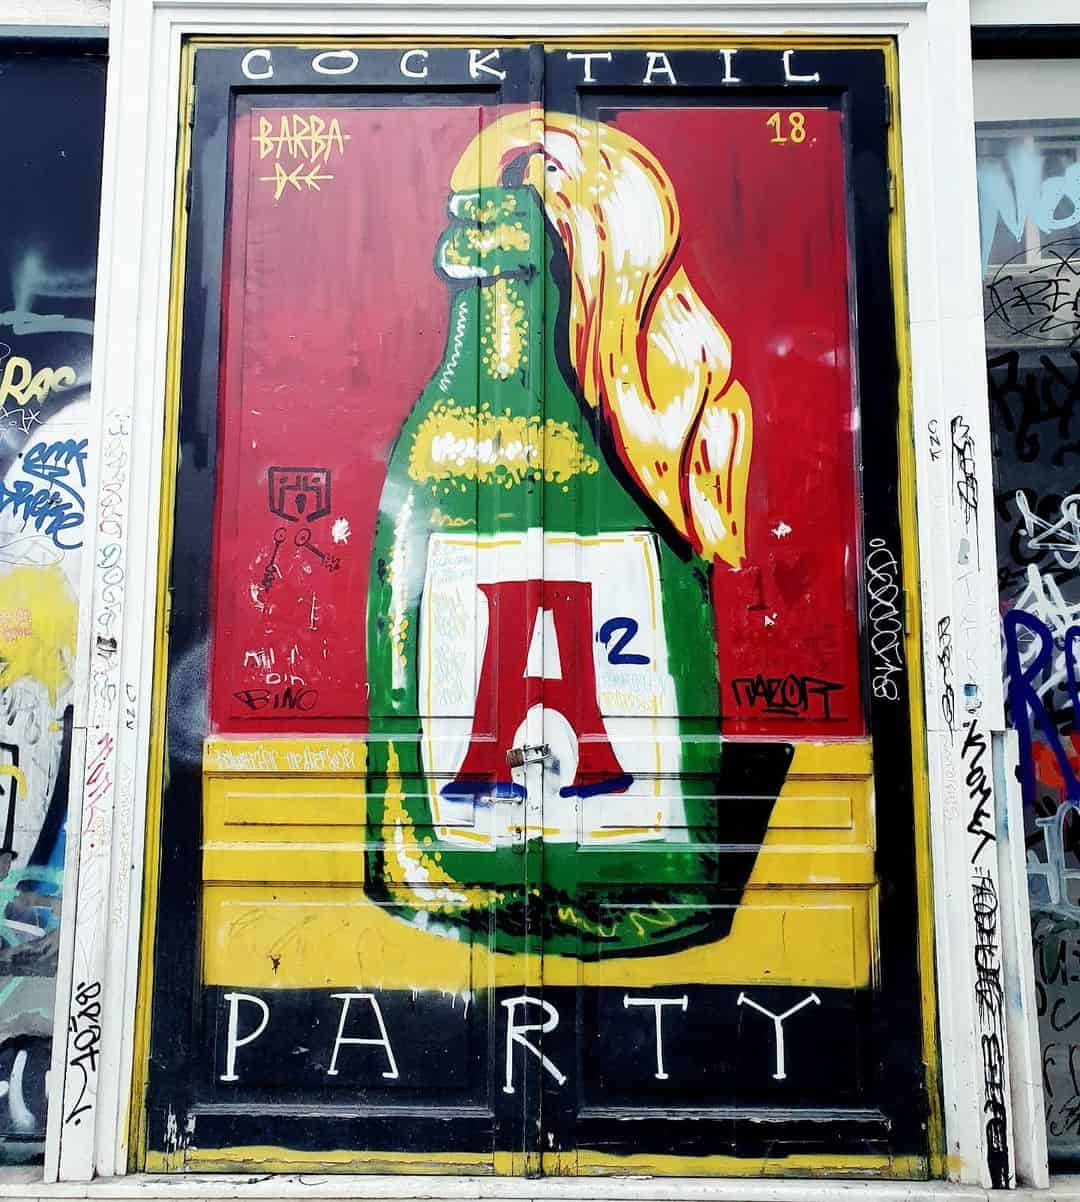 Psiri street art